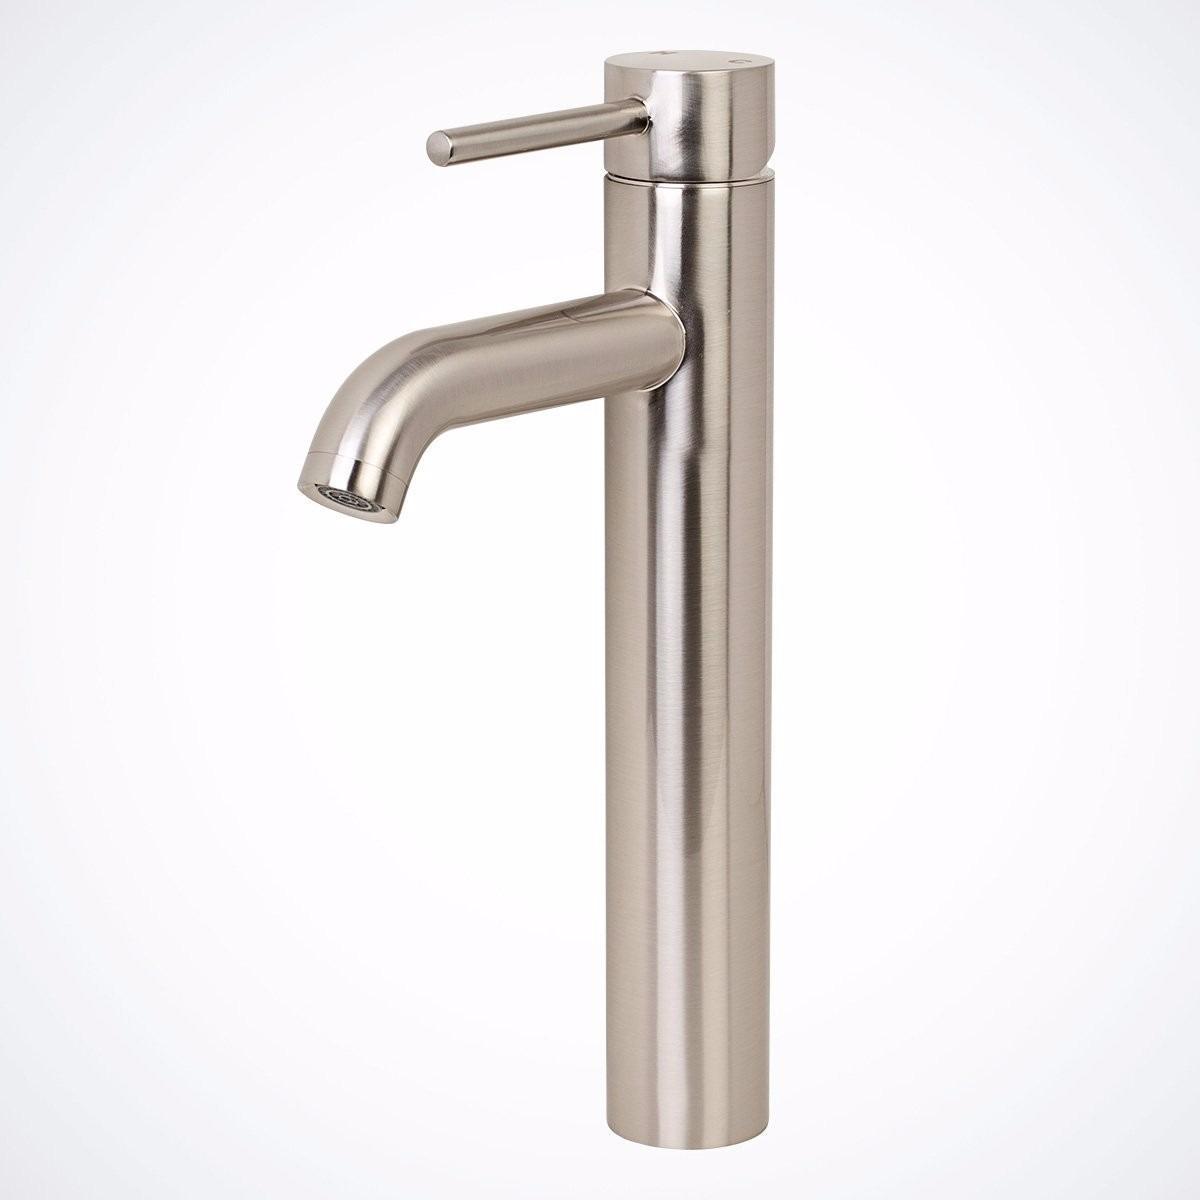 Odbo lb 7141hb monomando mezcladora larga satin para for Mezcladora para lavabo